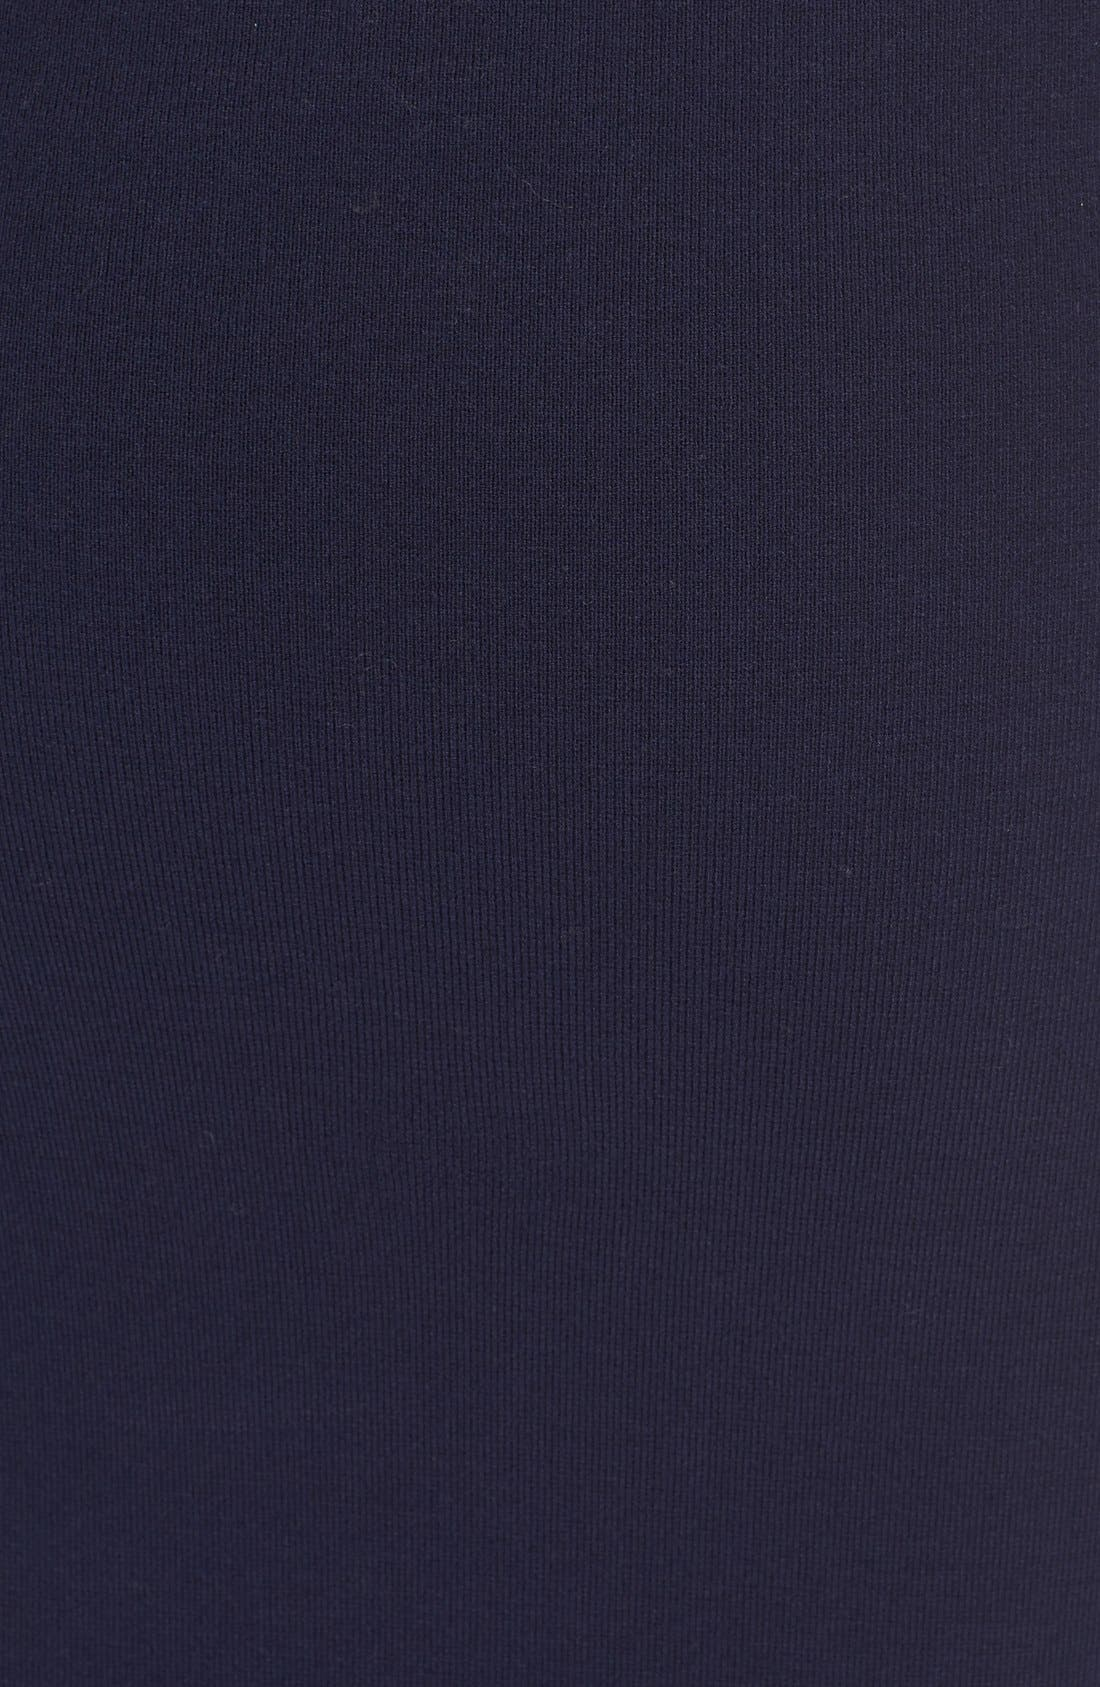 Alternate Image 5  - Milly Structured Side Slit Skirt